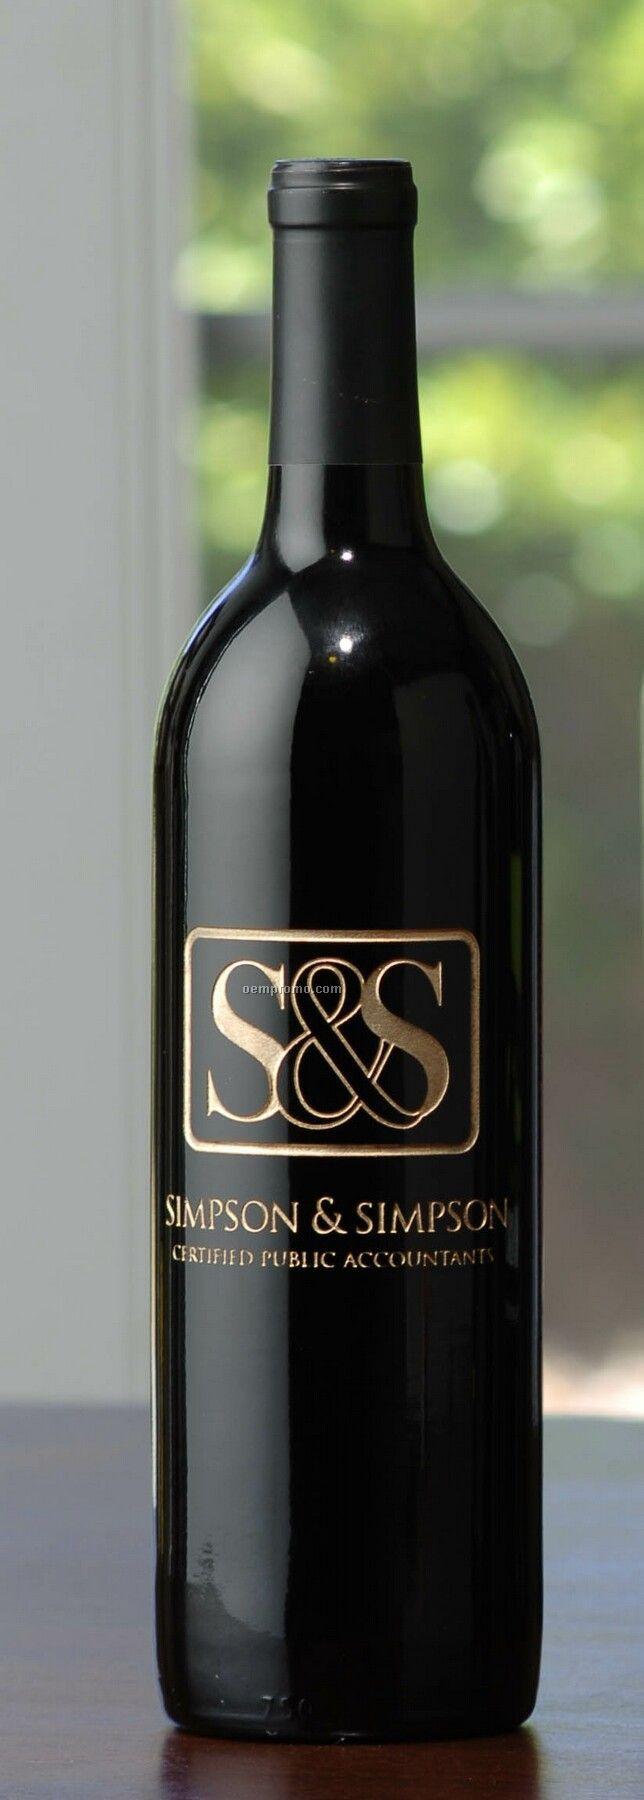 2009 Wv Chardonnay, Sonoma County, Barrel Fermented (Etched Wine)